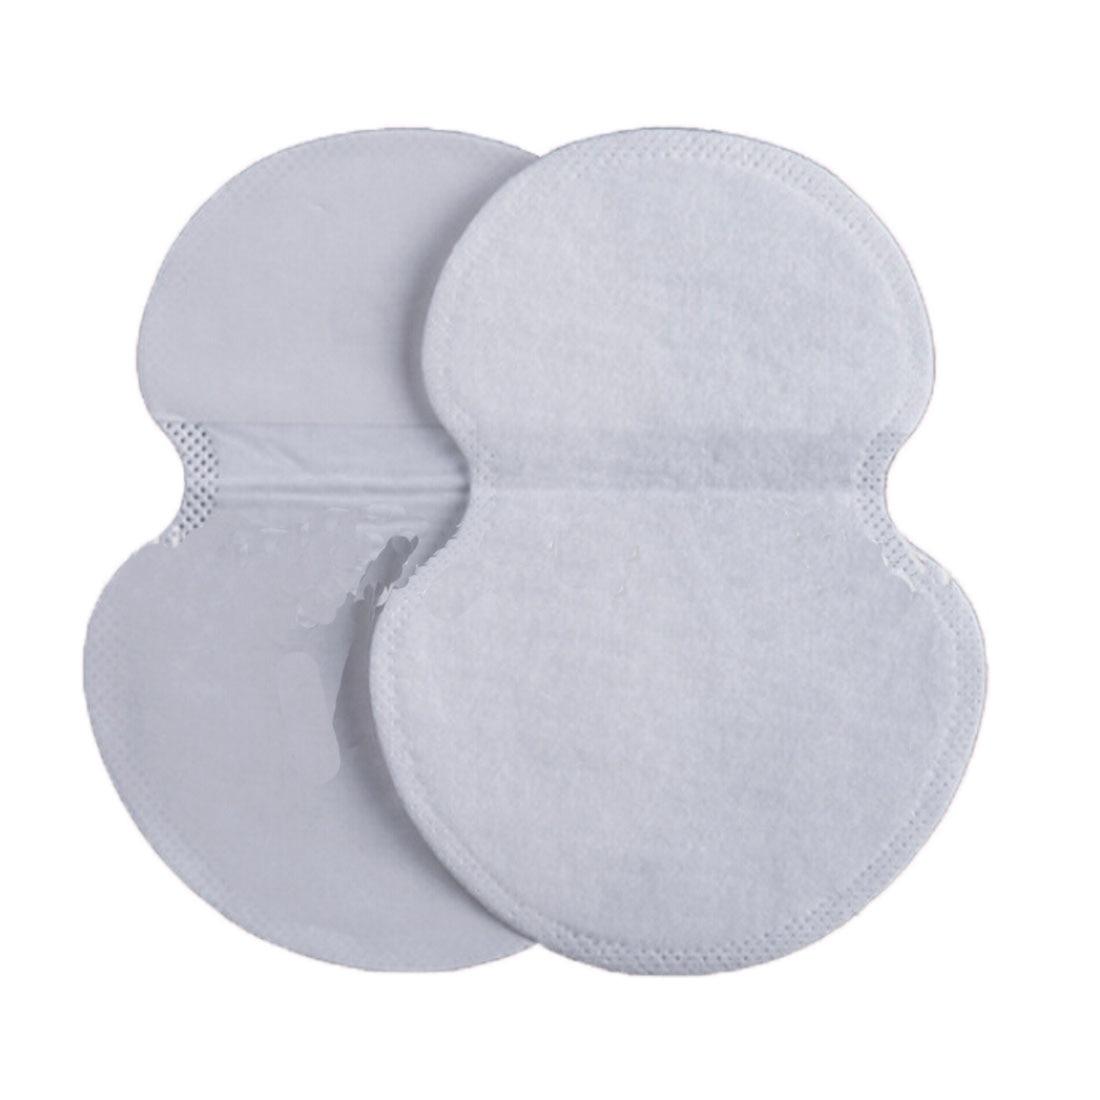 Hot Sale 30pcs Unisex Underarm Absorbing Sweat Gurd Pad Armpit Perspiration Antiperspirant Deodorant Sweat Absorption Paste